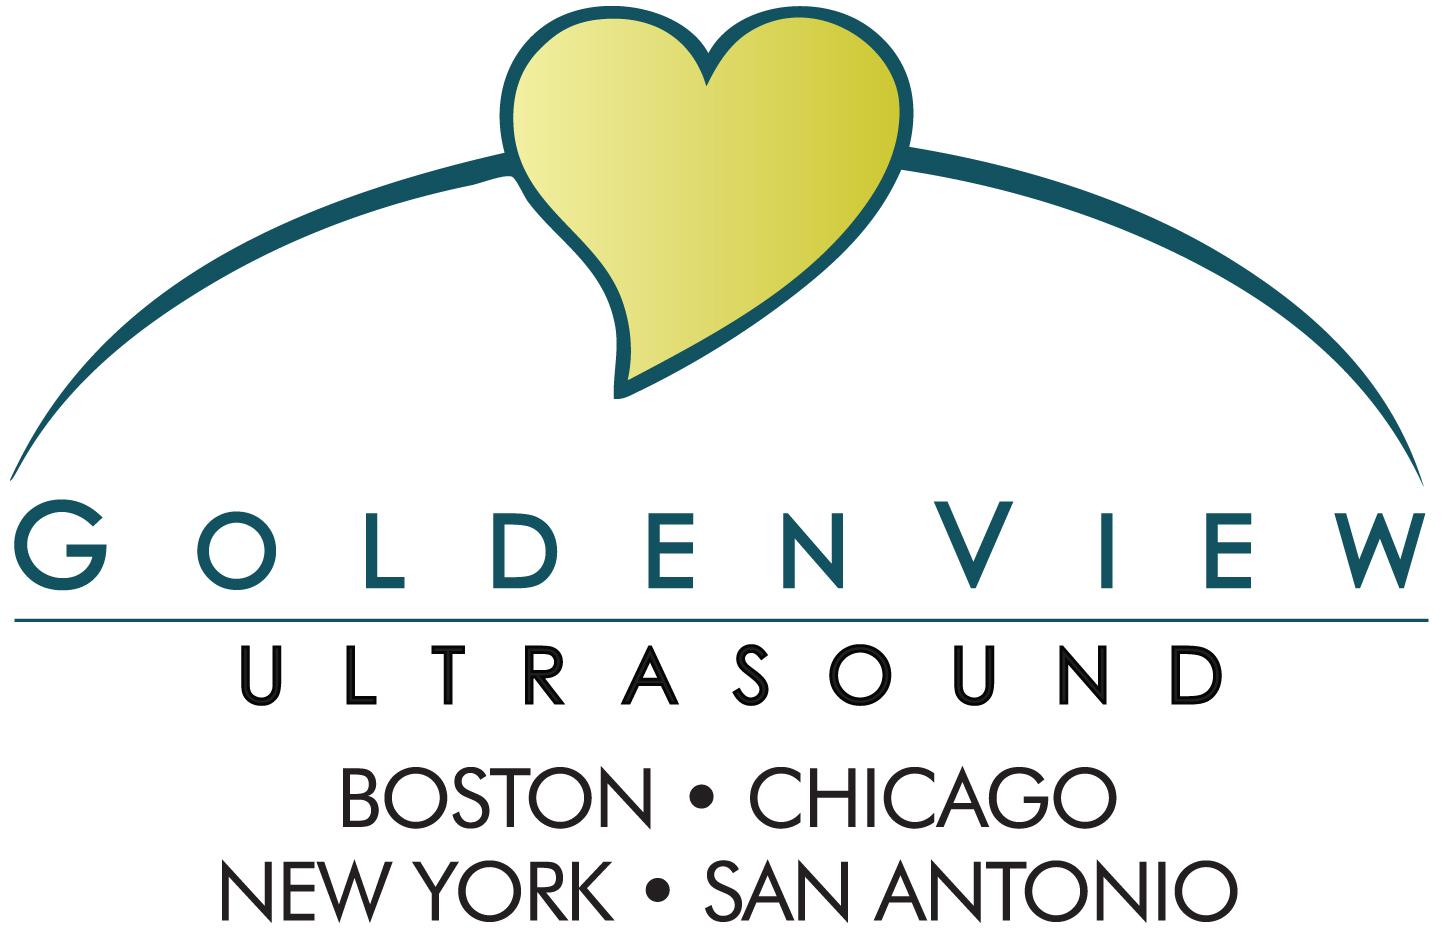 Goldenview Ultrasound Goldenview Ultrasound